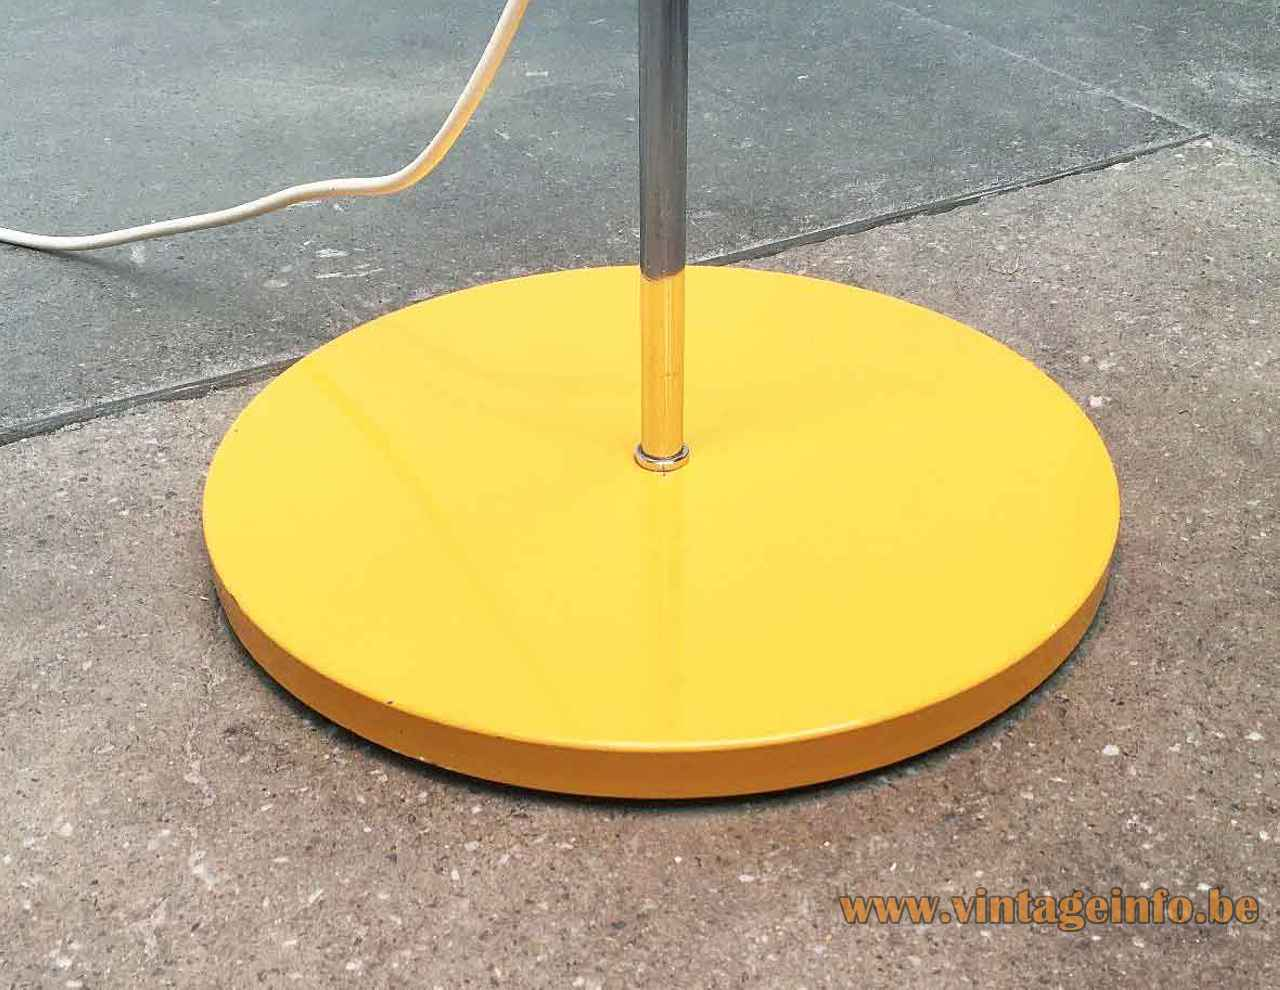 Edi Franz Swisslamps floor lamp round yellow painted metal base chrome rod 1950s 1960s Switzerland